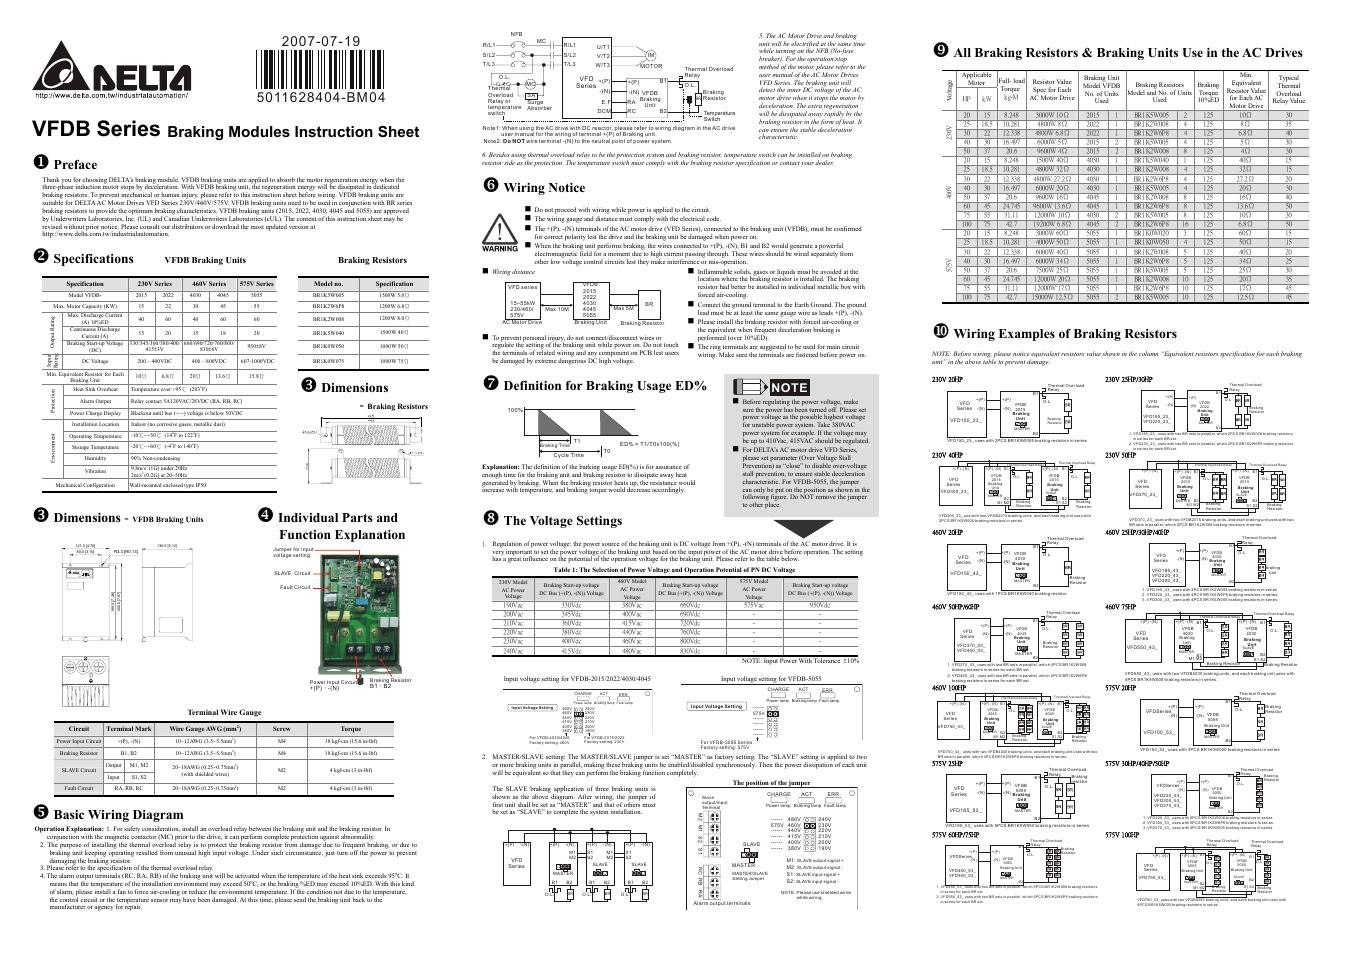 Delta Vfd Control Wiring Diagram Library Huanyang Electronics Braking Modules Vfdb Series User Manual 2 Pages